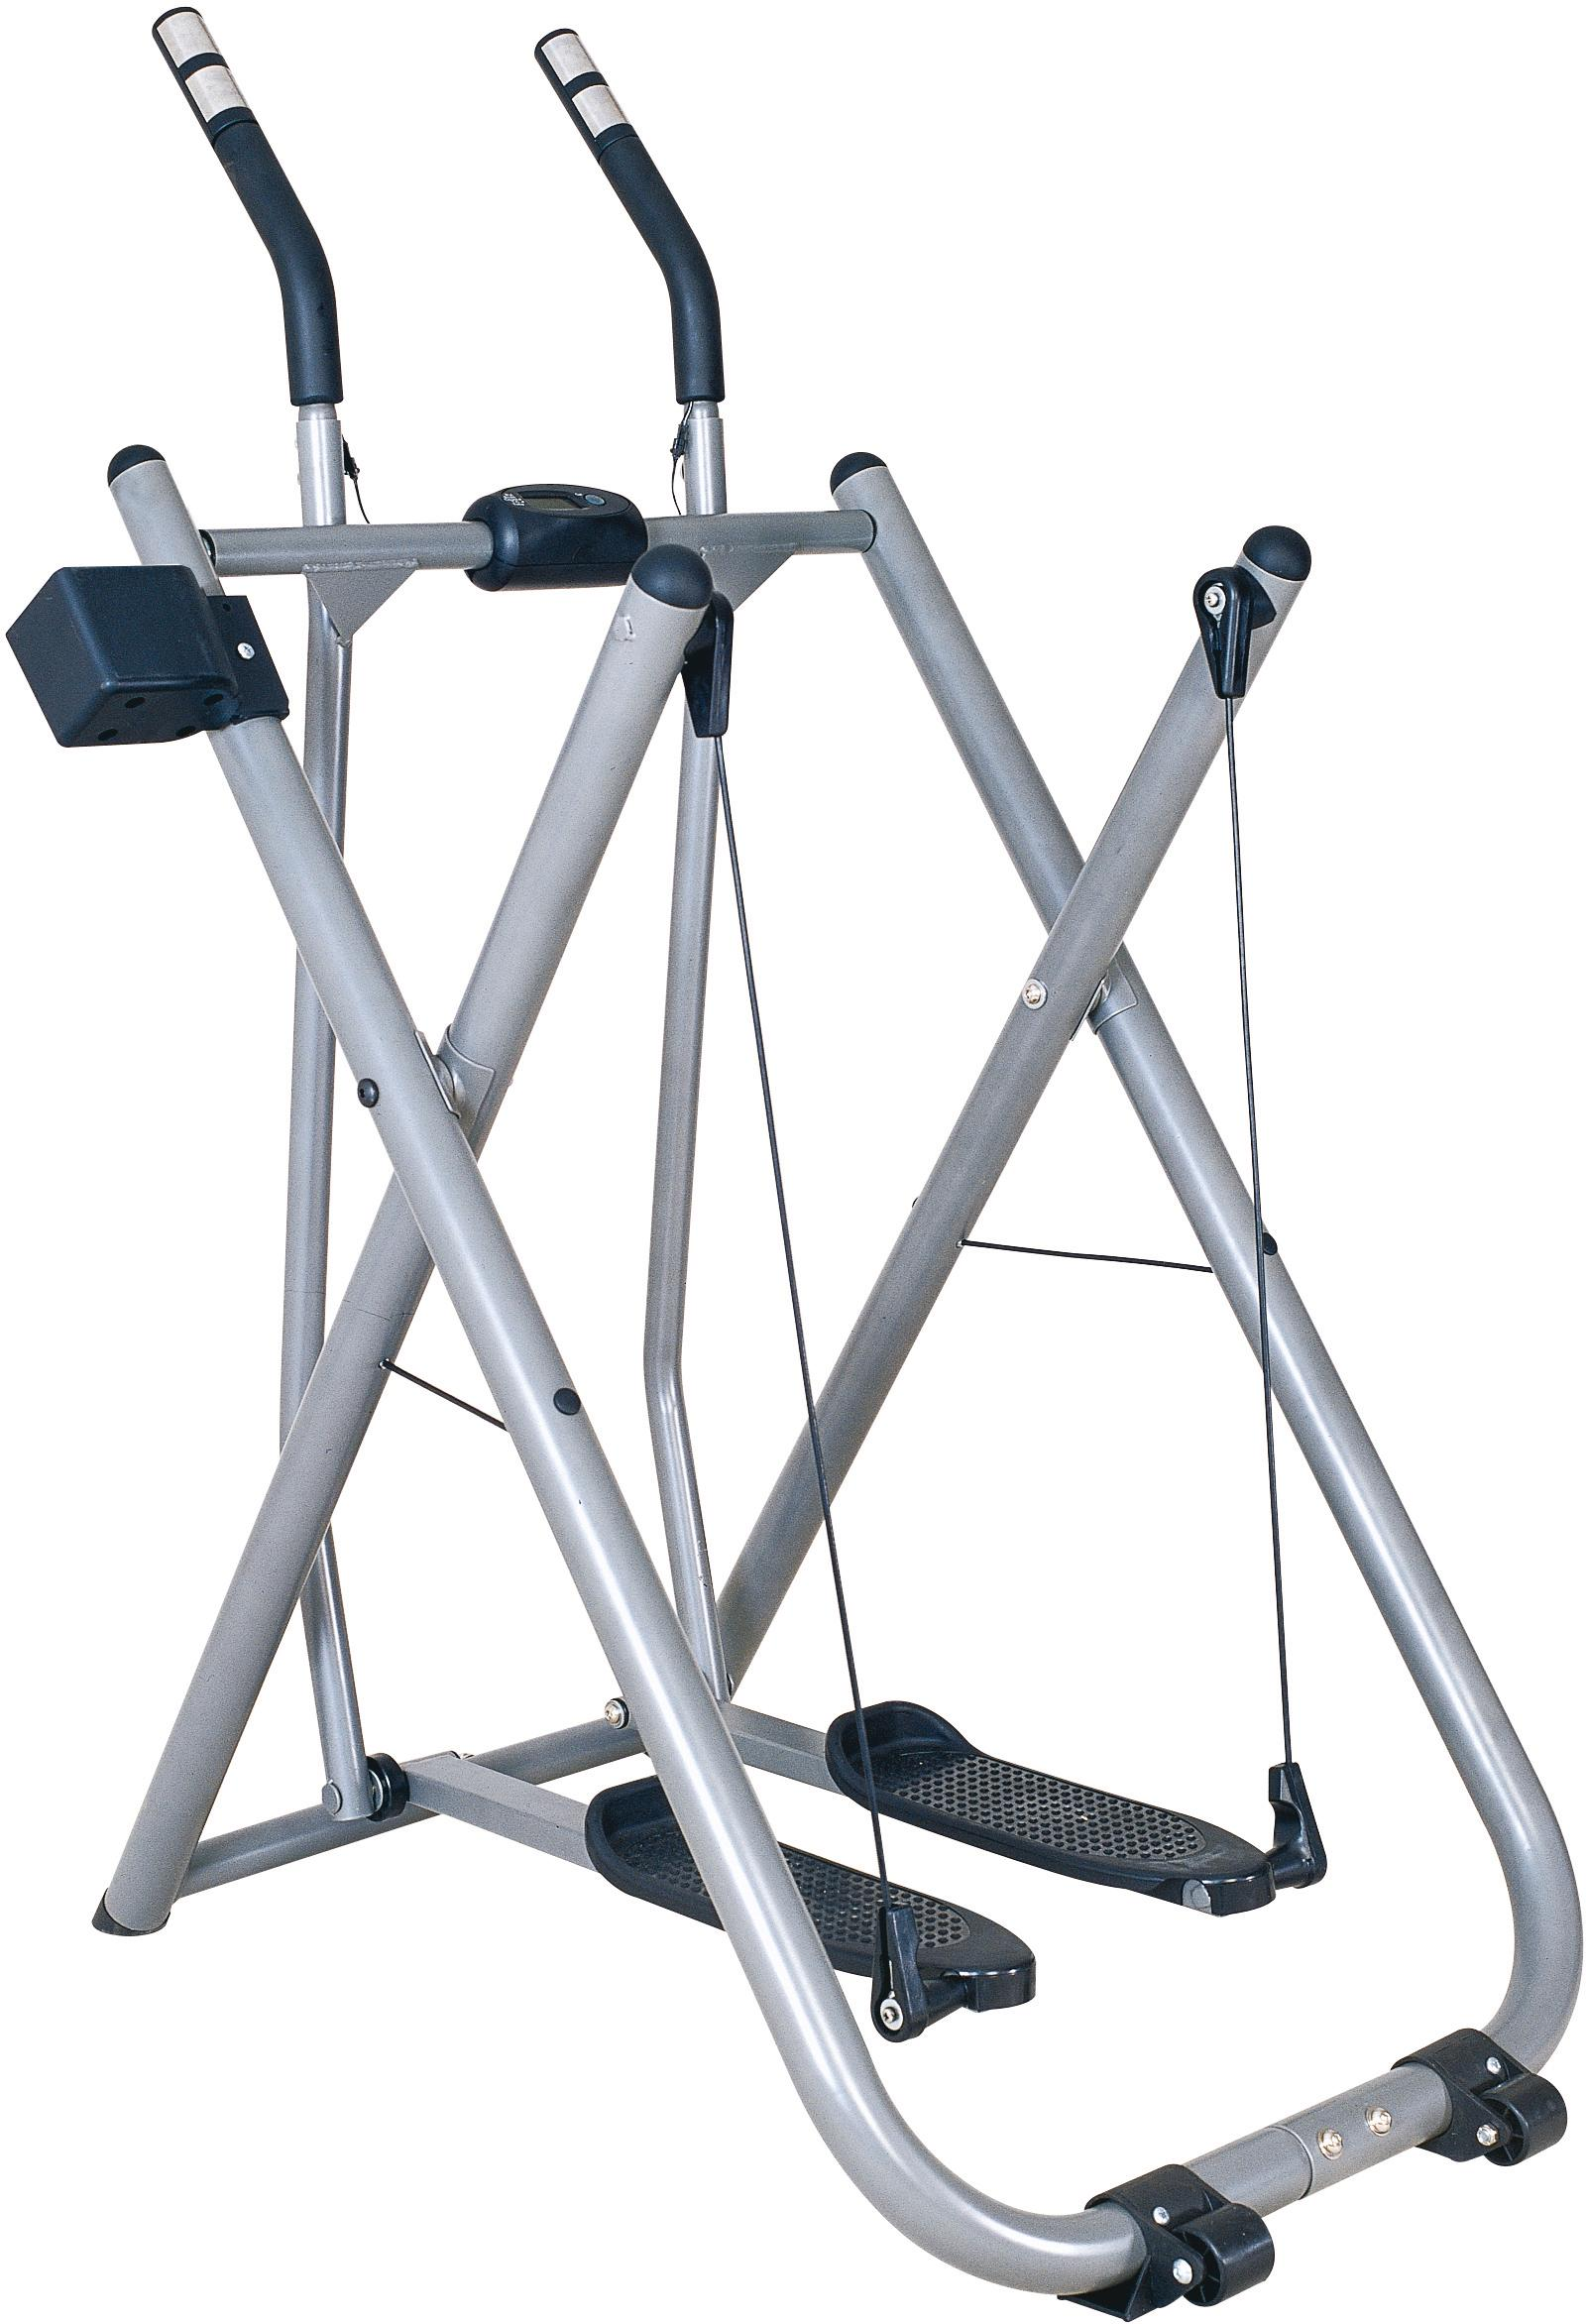 body coach Crosstrainer Nordic Walker Crosstrainer Technik & Freizeit/Sport & Freizeit/Fitnessgeräte/Crosstrainer